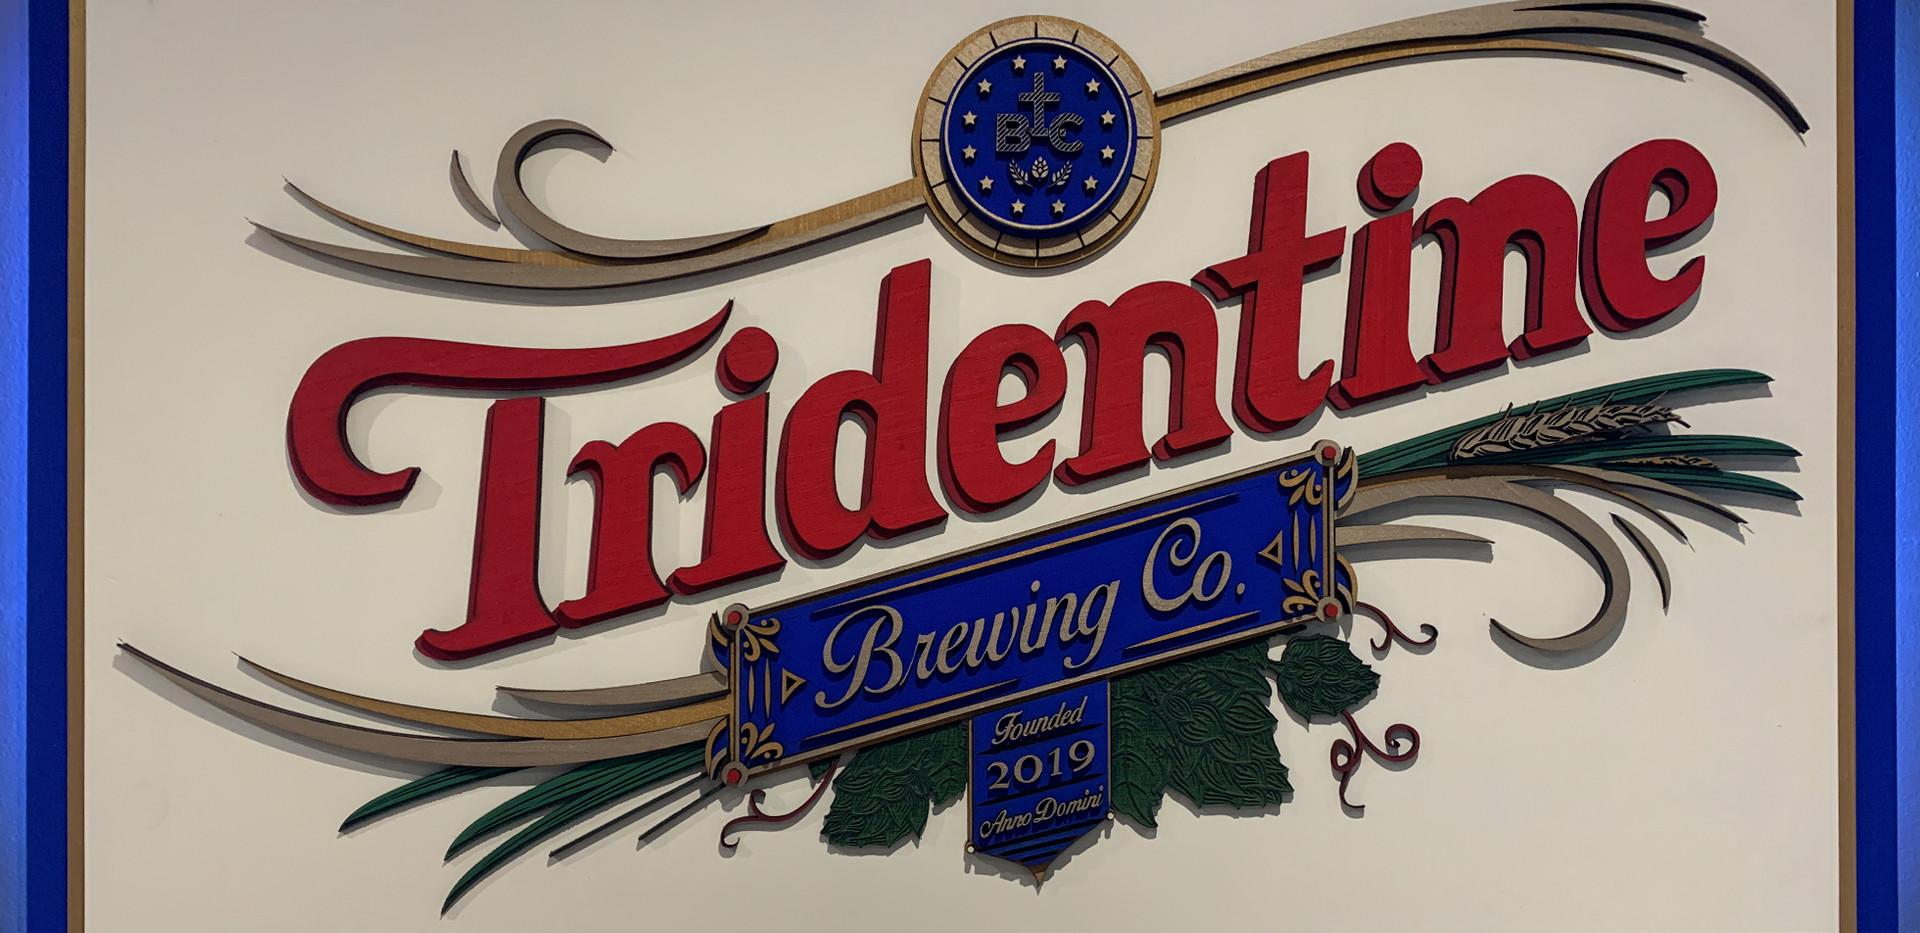 Tridentine_3.jpg